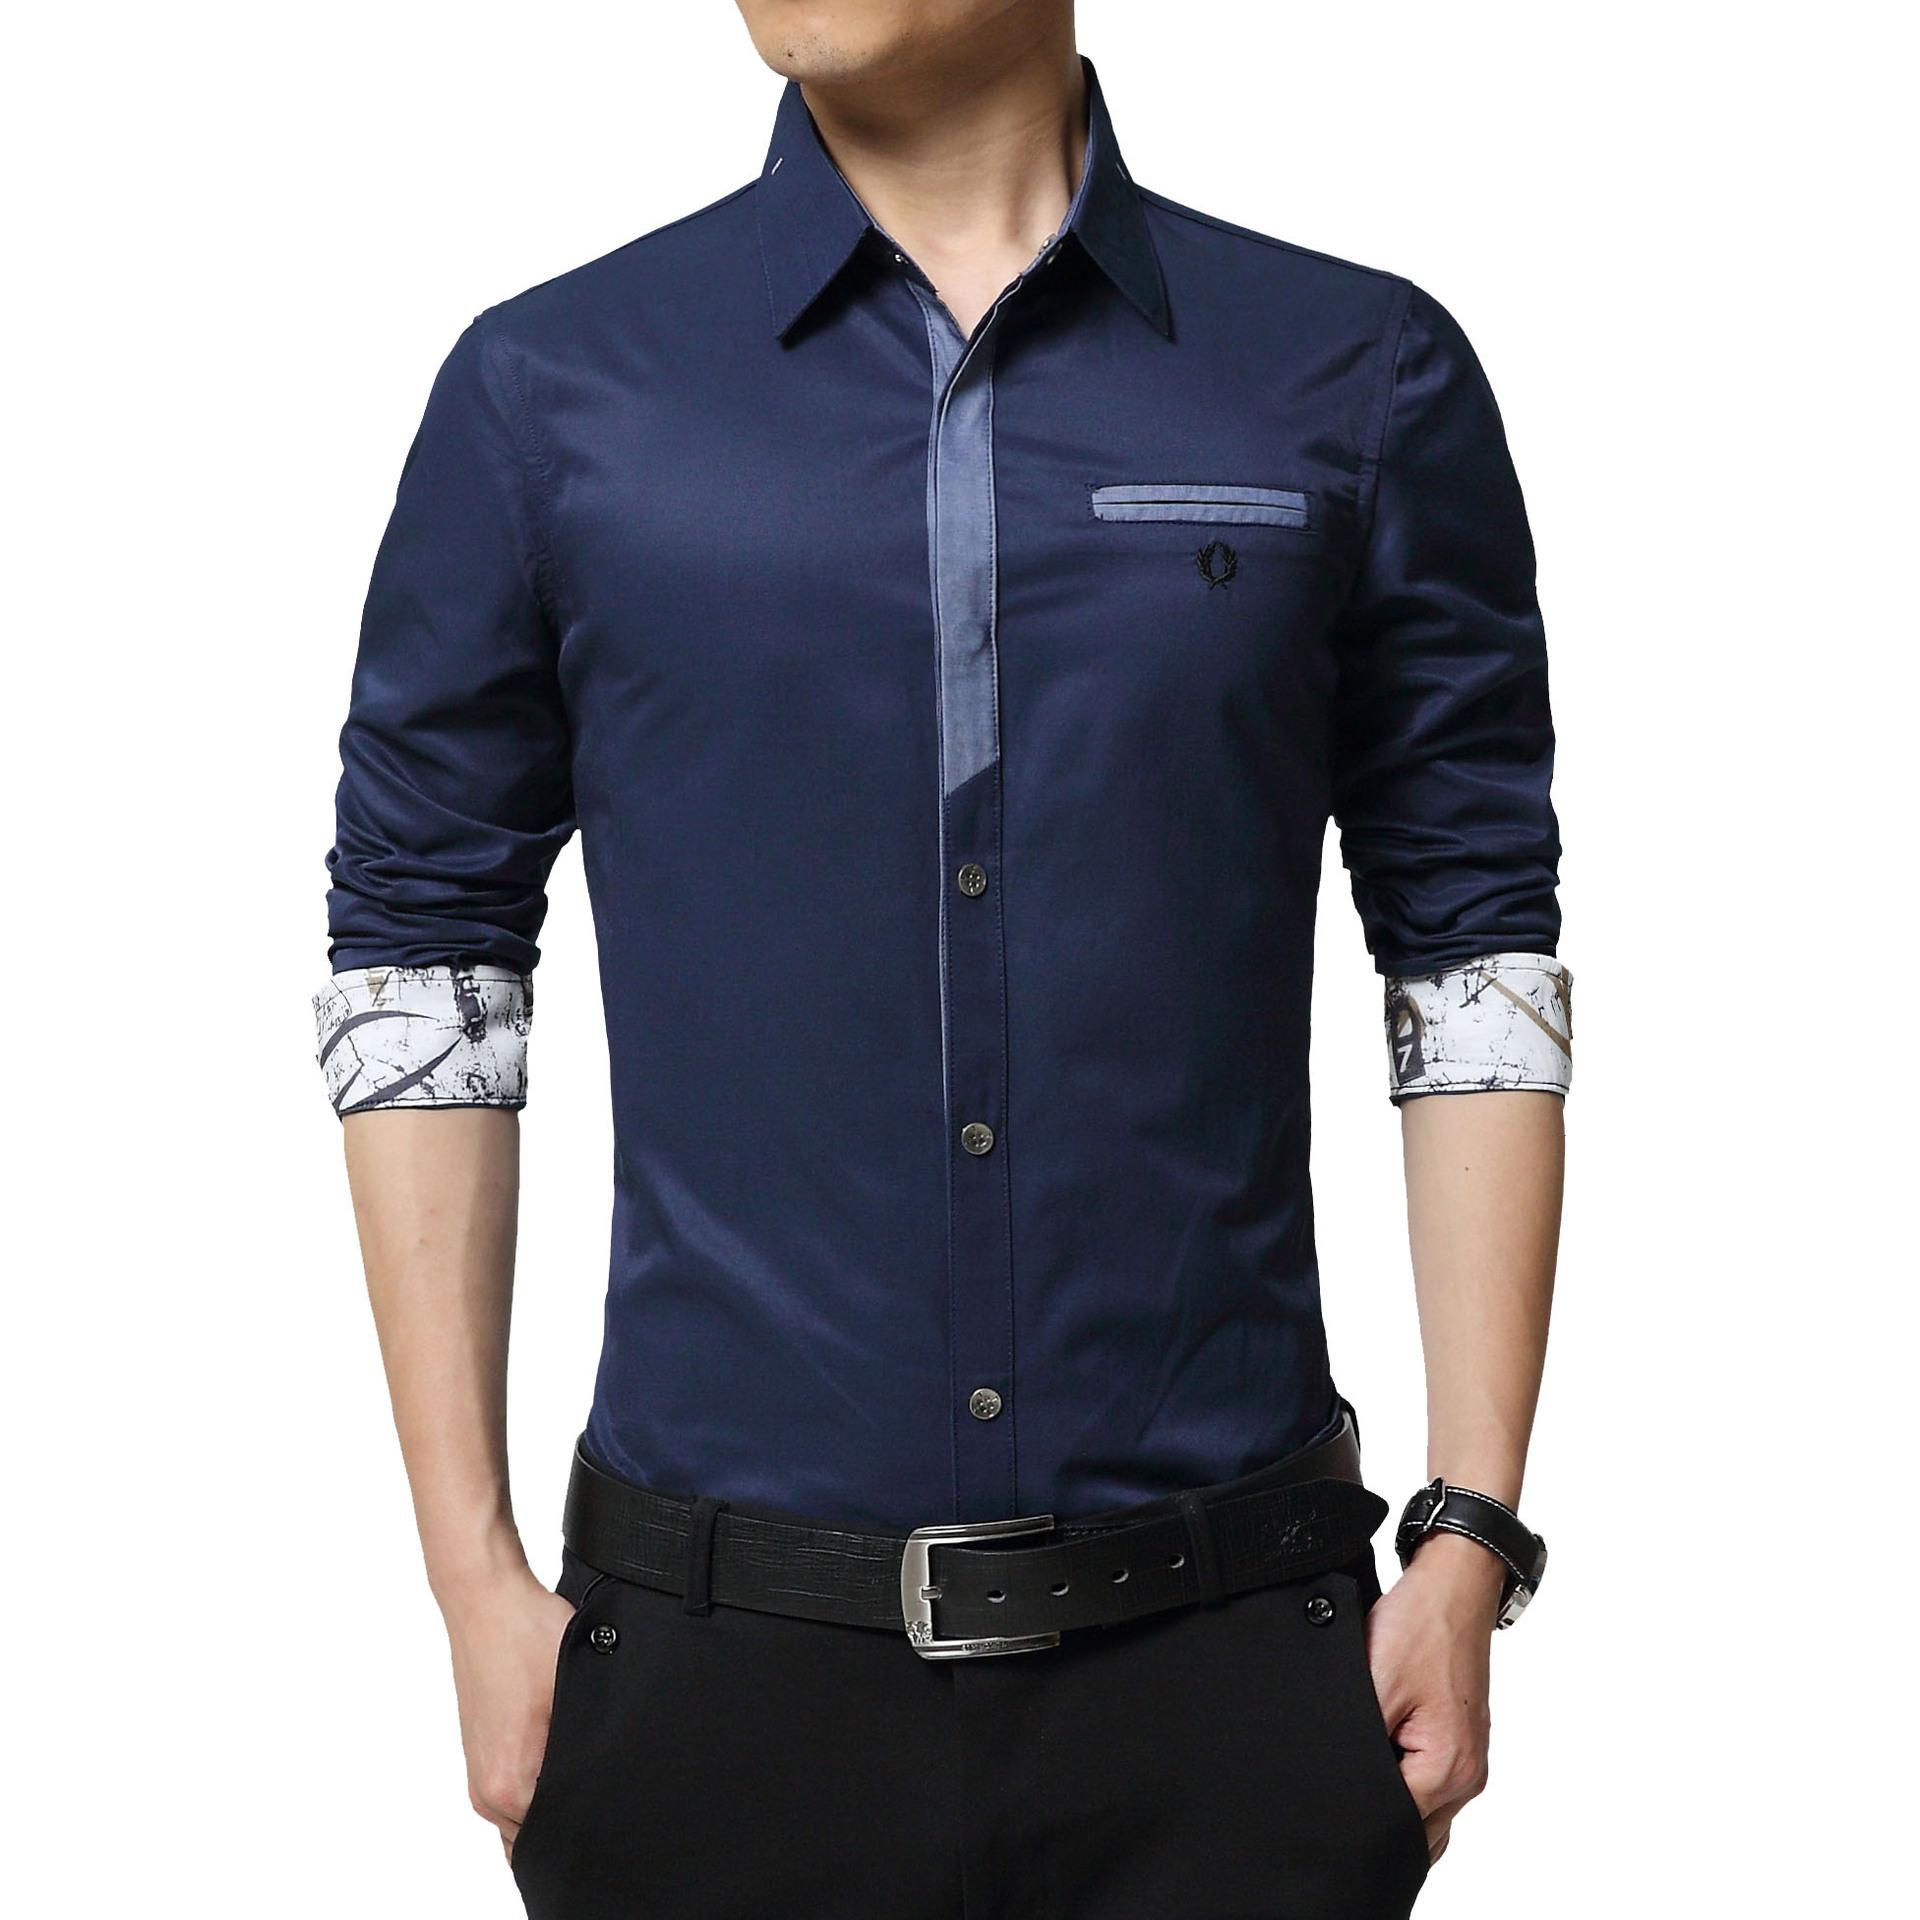 Floral Print Striped Dress Men Shirt Uniform Mens Long Sleeve Slim Fit Top Vintage Cotton Button Down Shirts Camisa Masculina 40